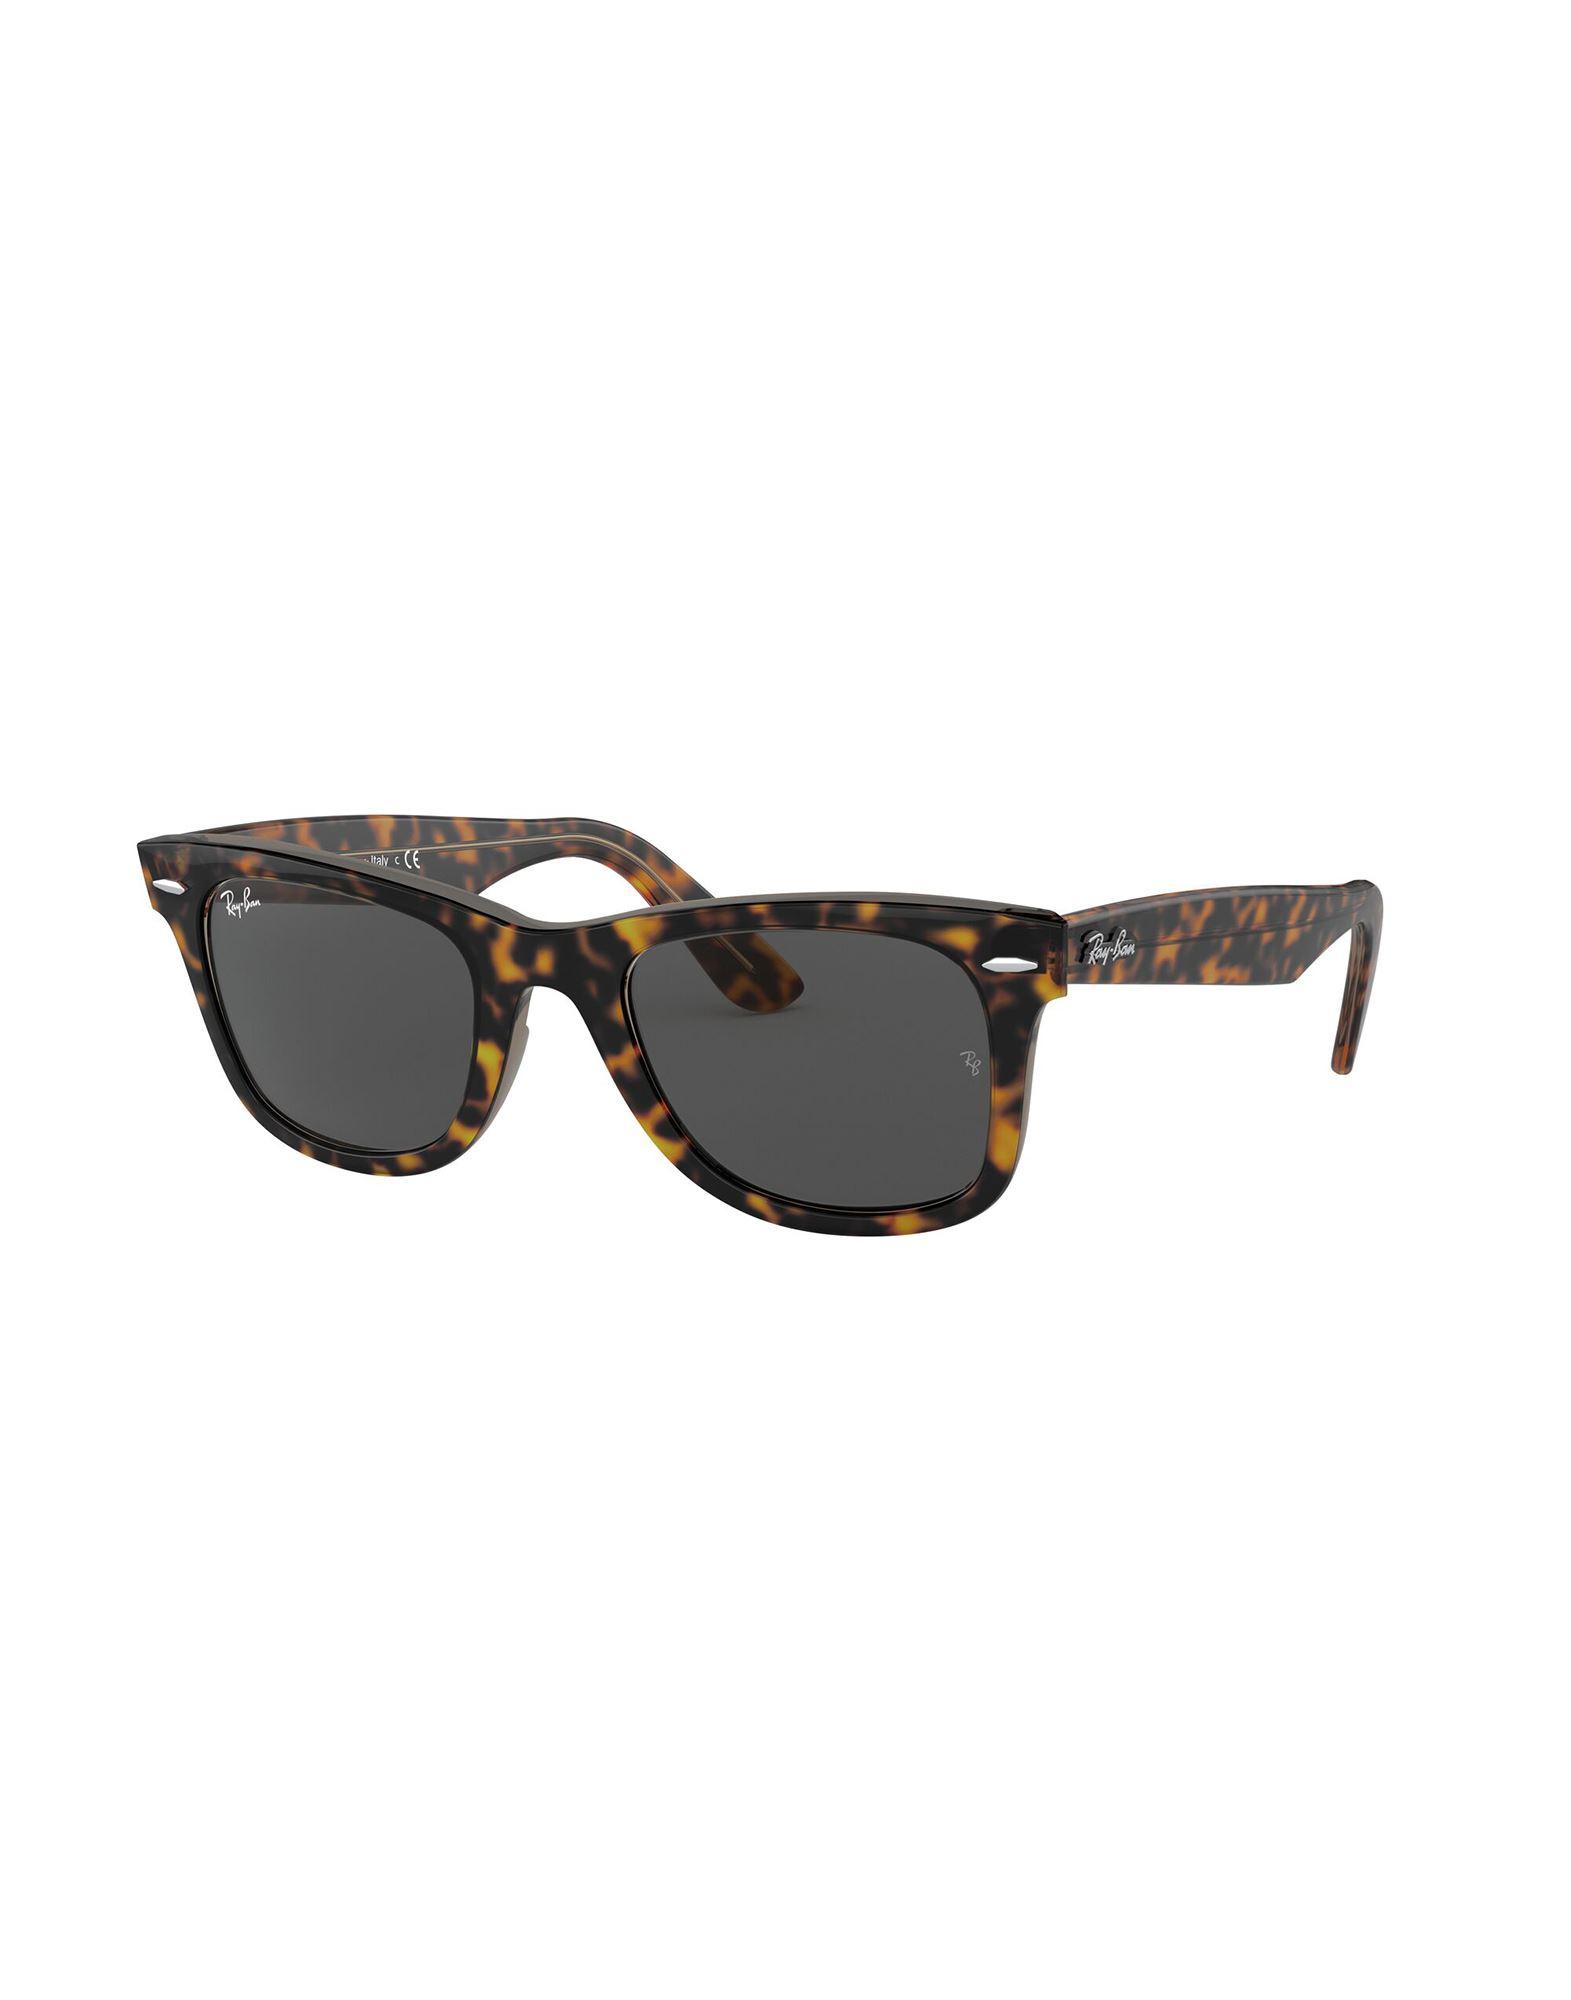 RAY-BAN Солнечные очки солнцезащитные очки ray ban rayban wayfarer rb2140 901